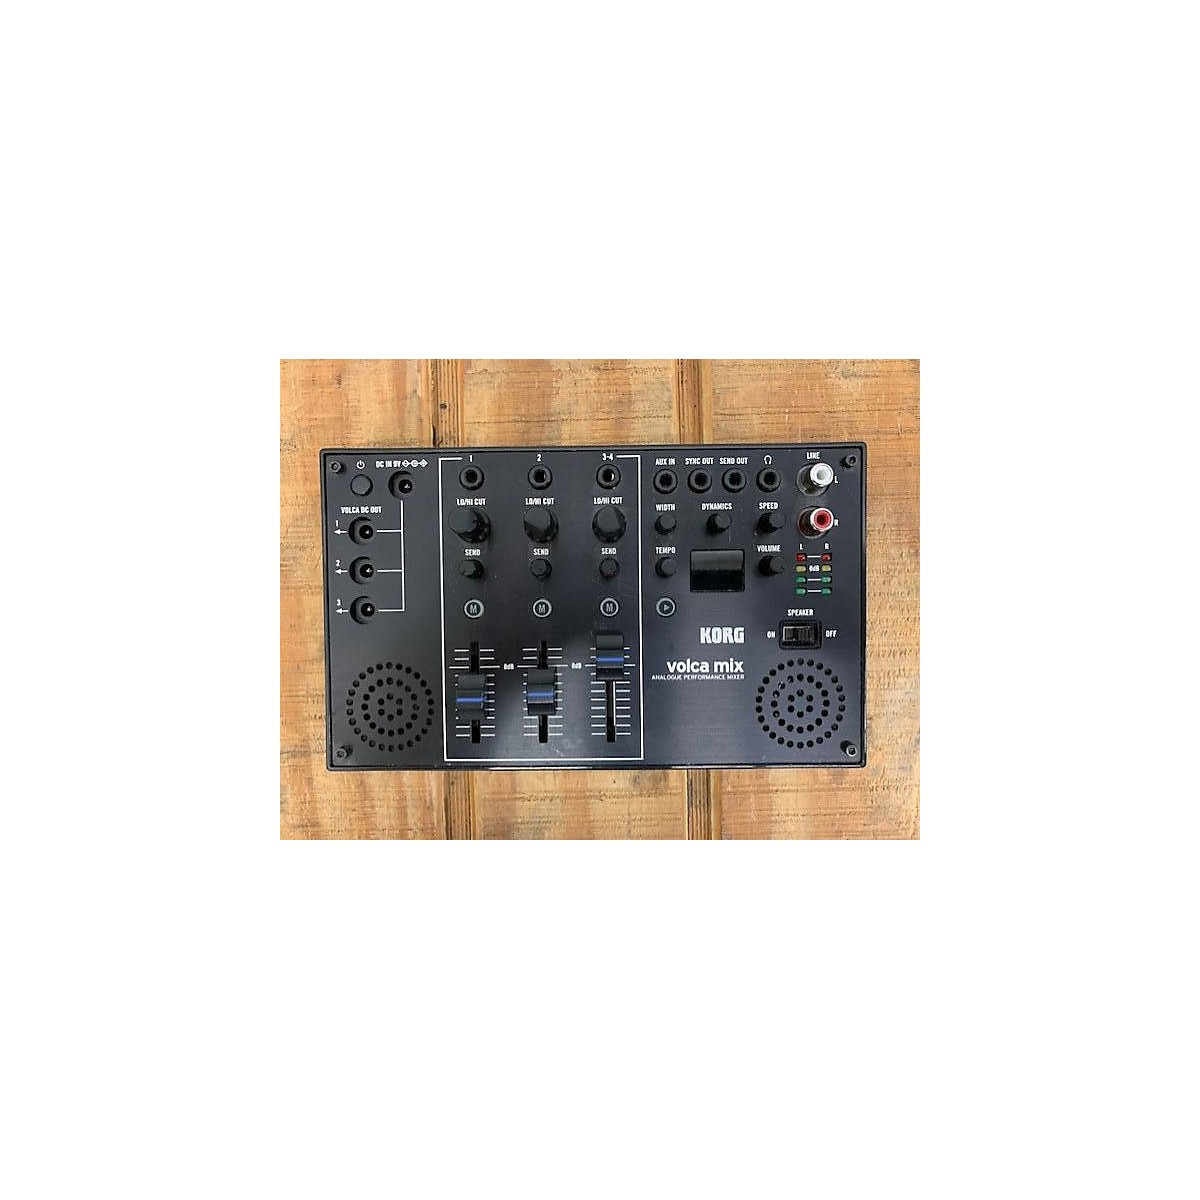 Korg VOLCA MIX Digital Mixer